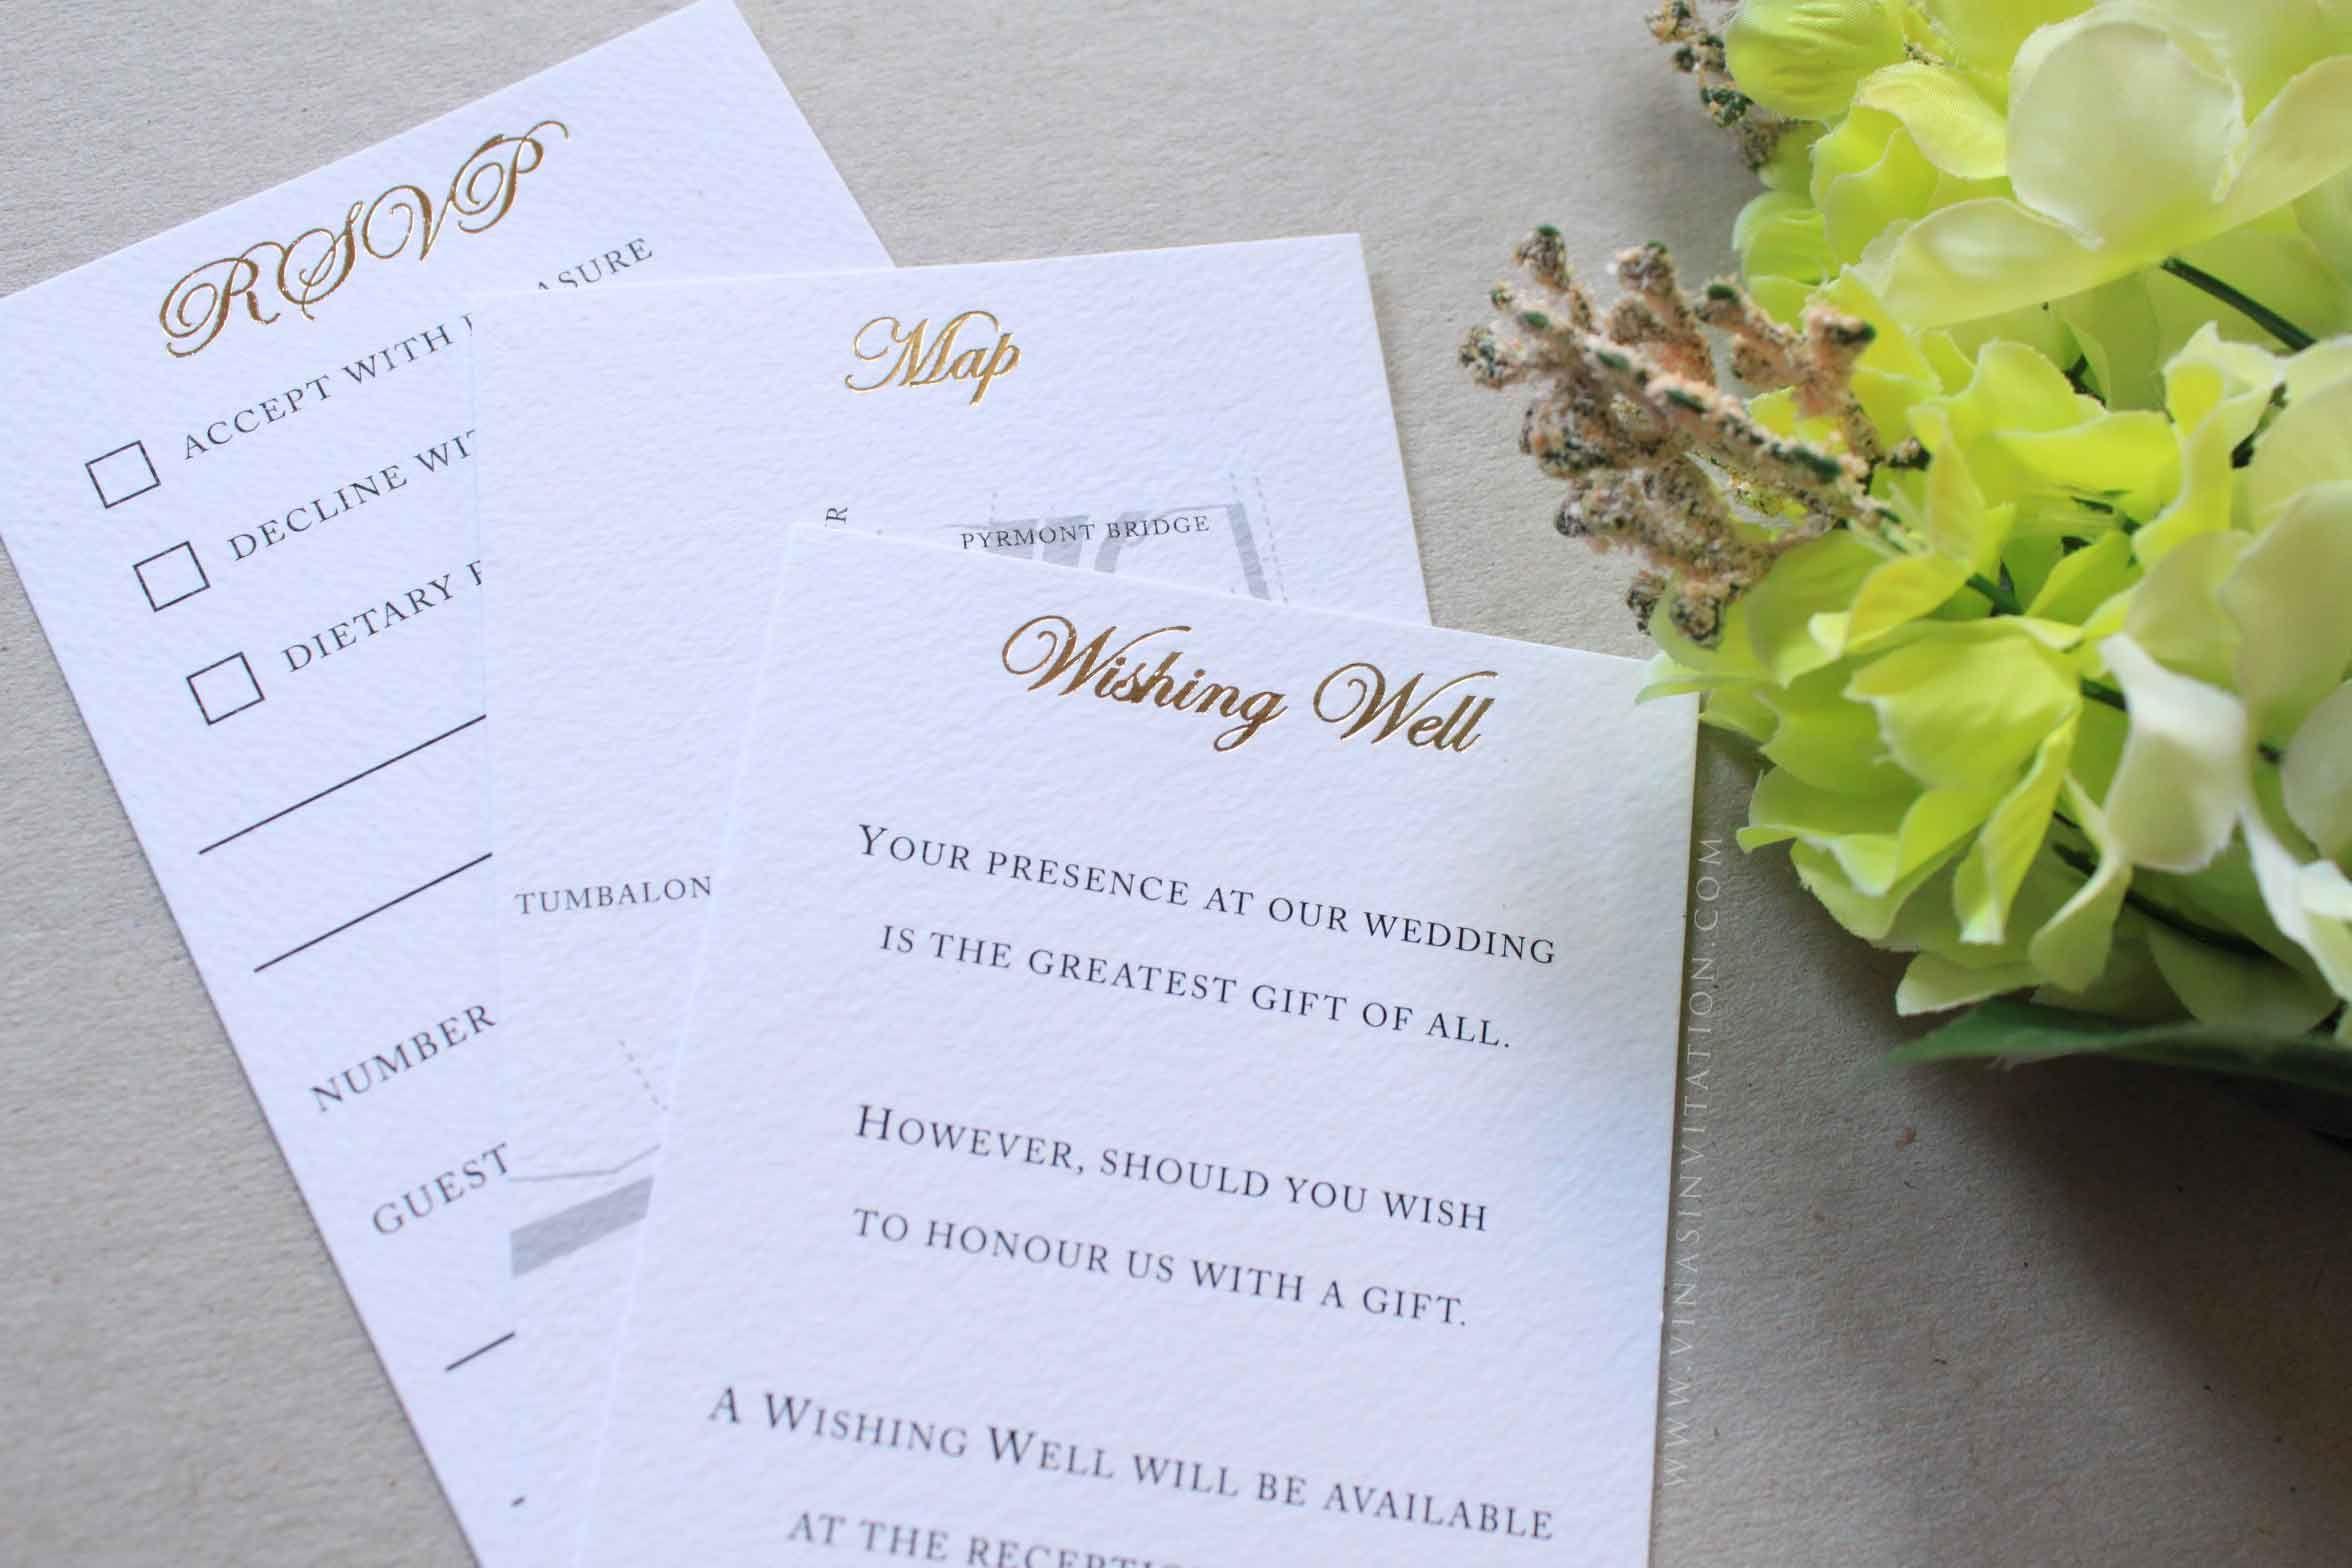 Wedding Invitations Sydney: Vinas Invitation. Black And Gold Invitation. Australian